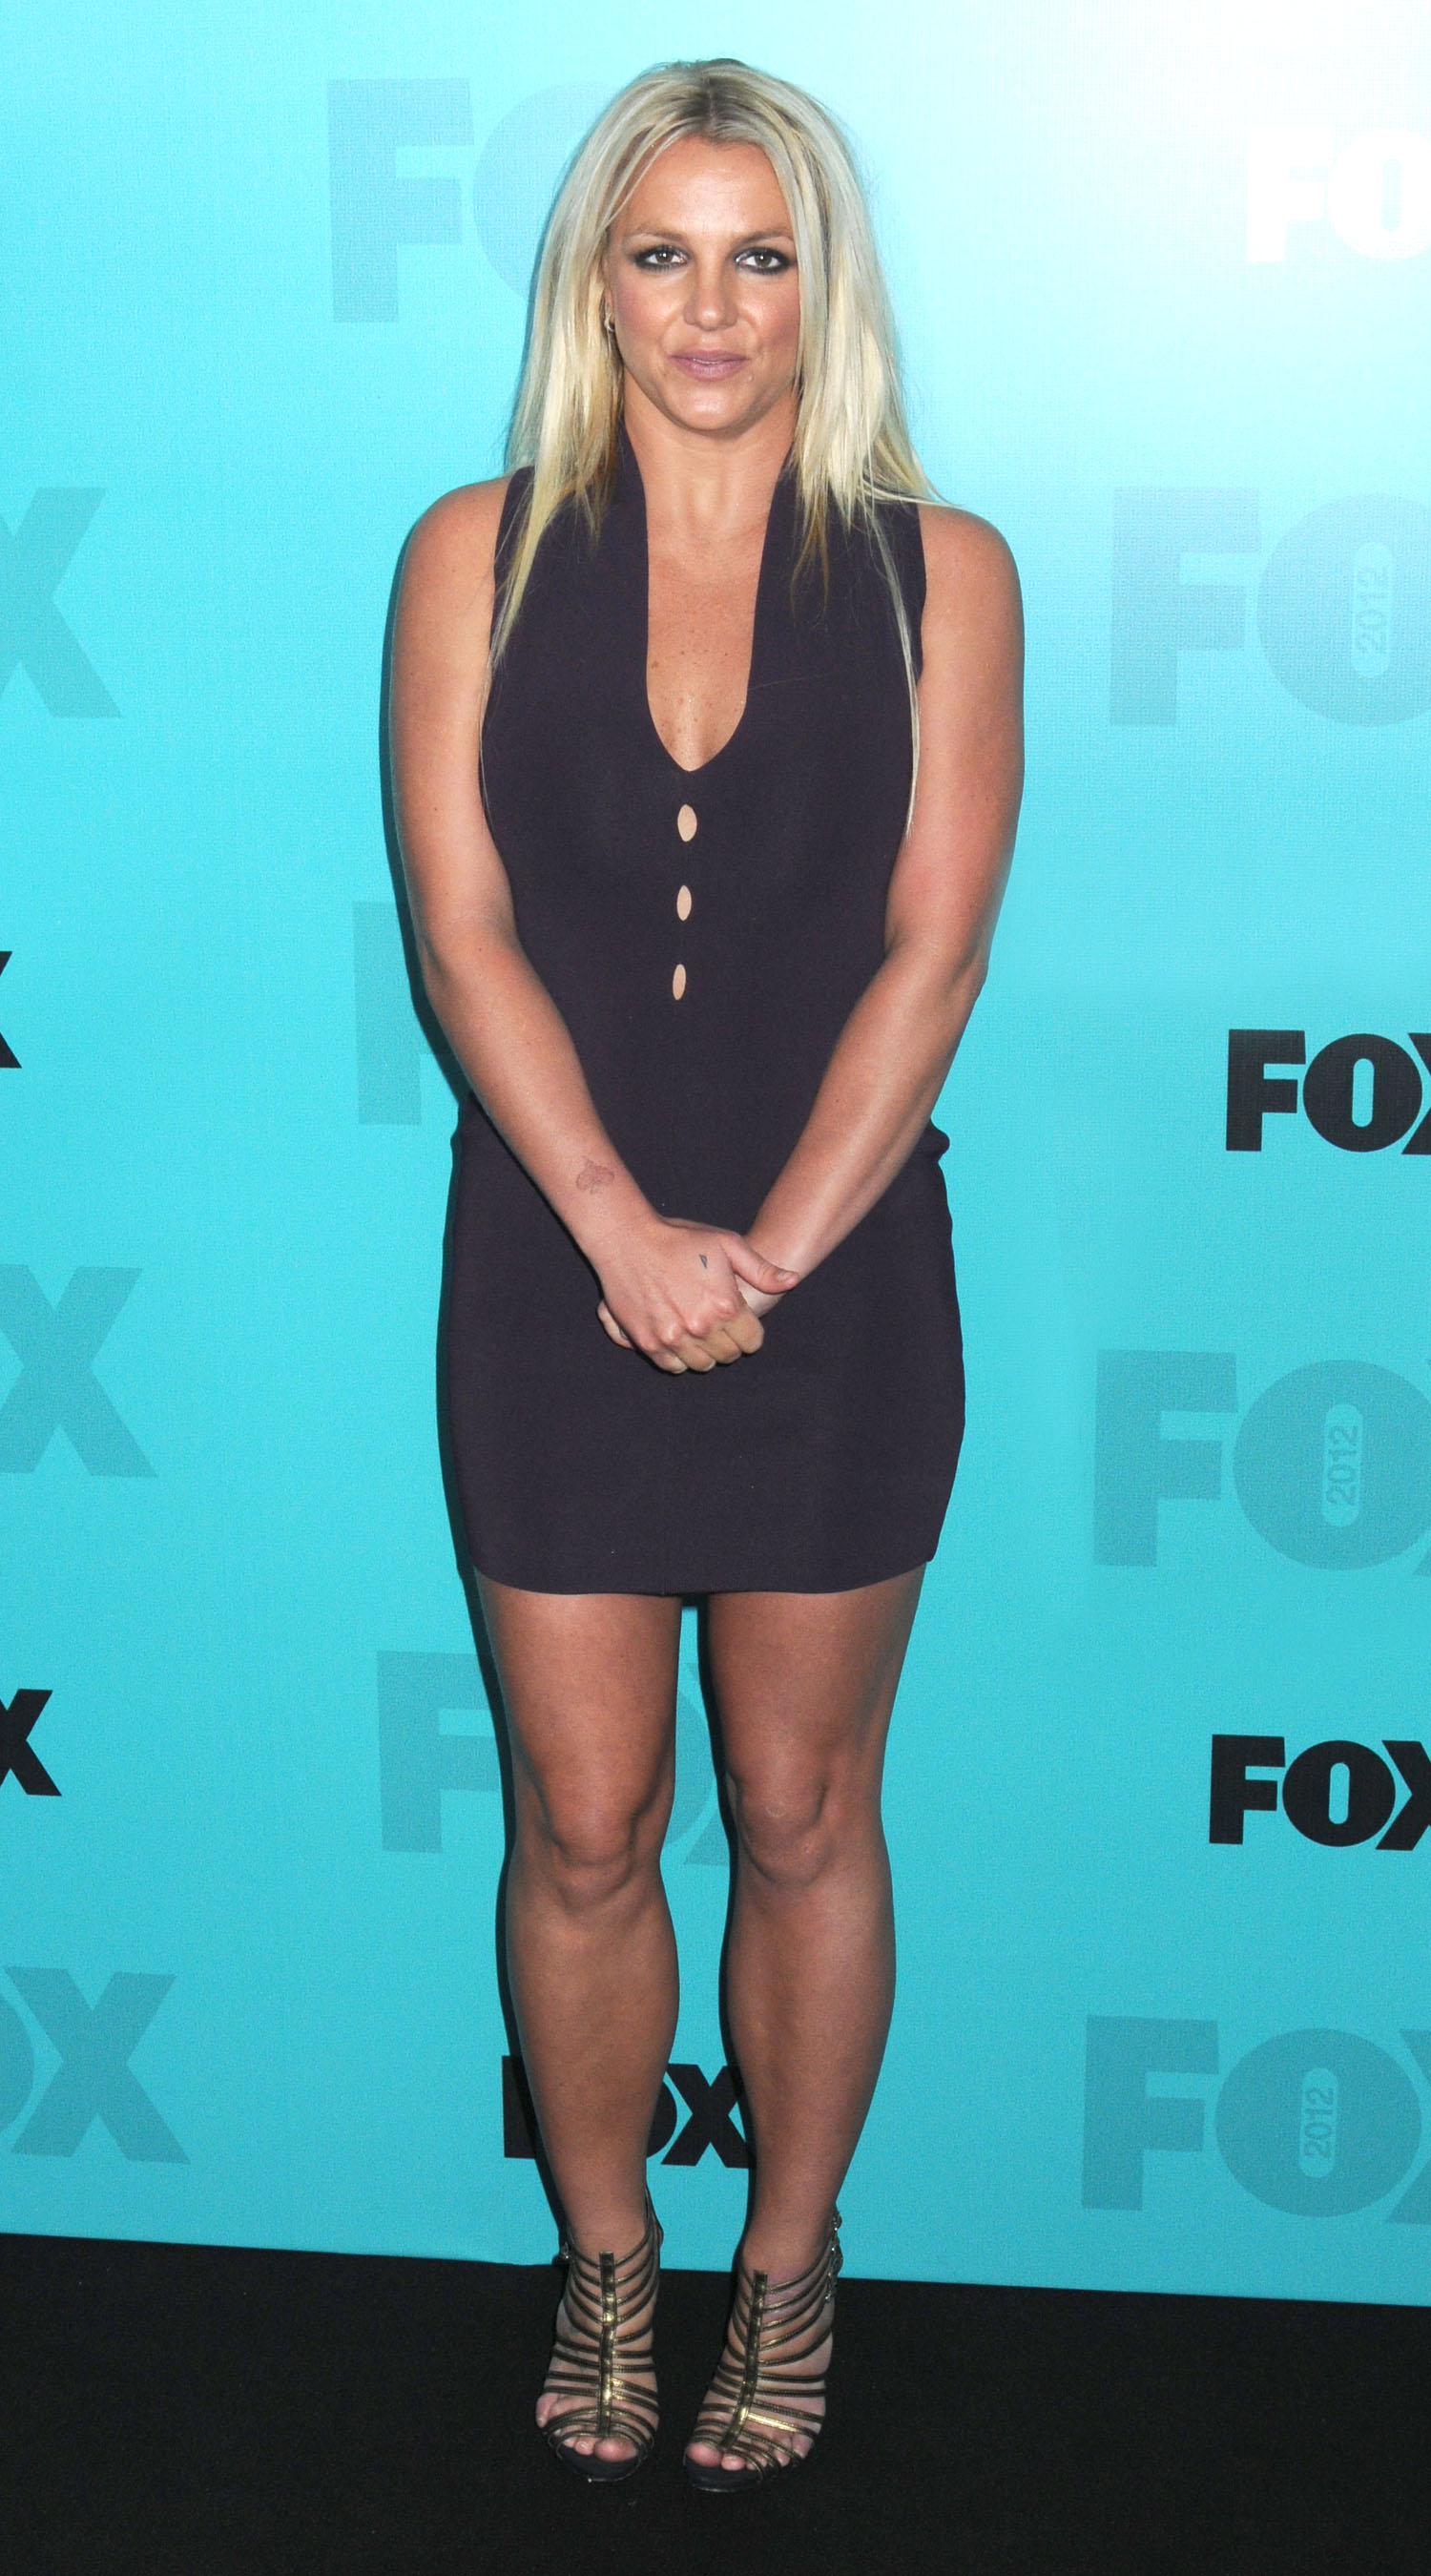 Britney Spears Fierce At Fox Upfronts Idolator